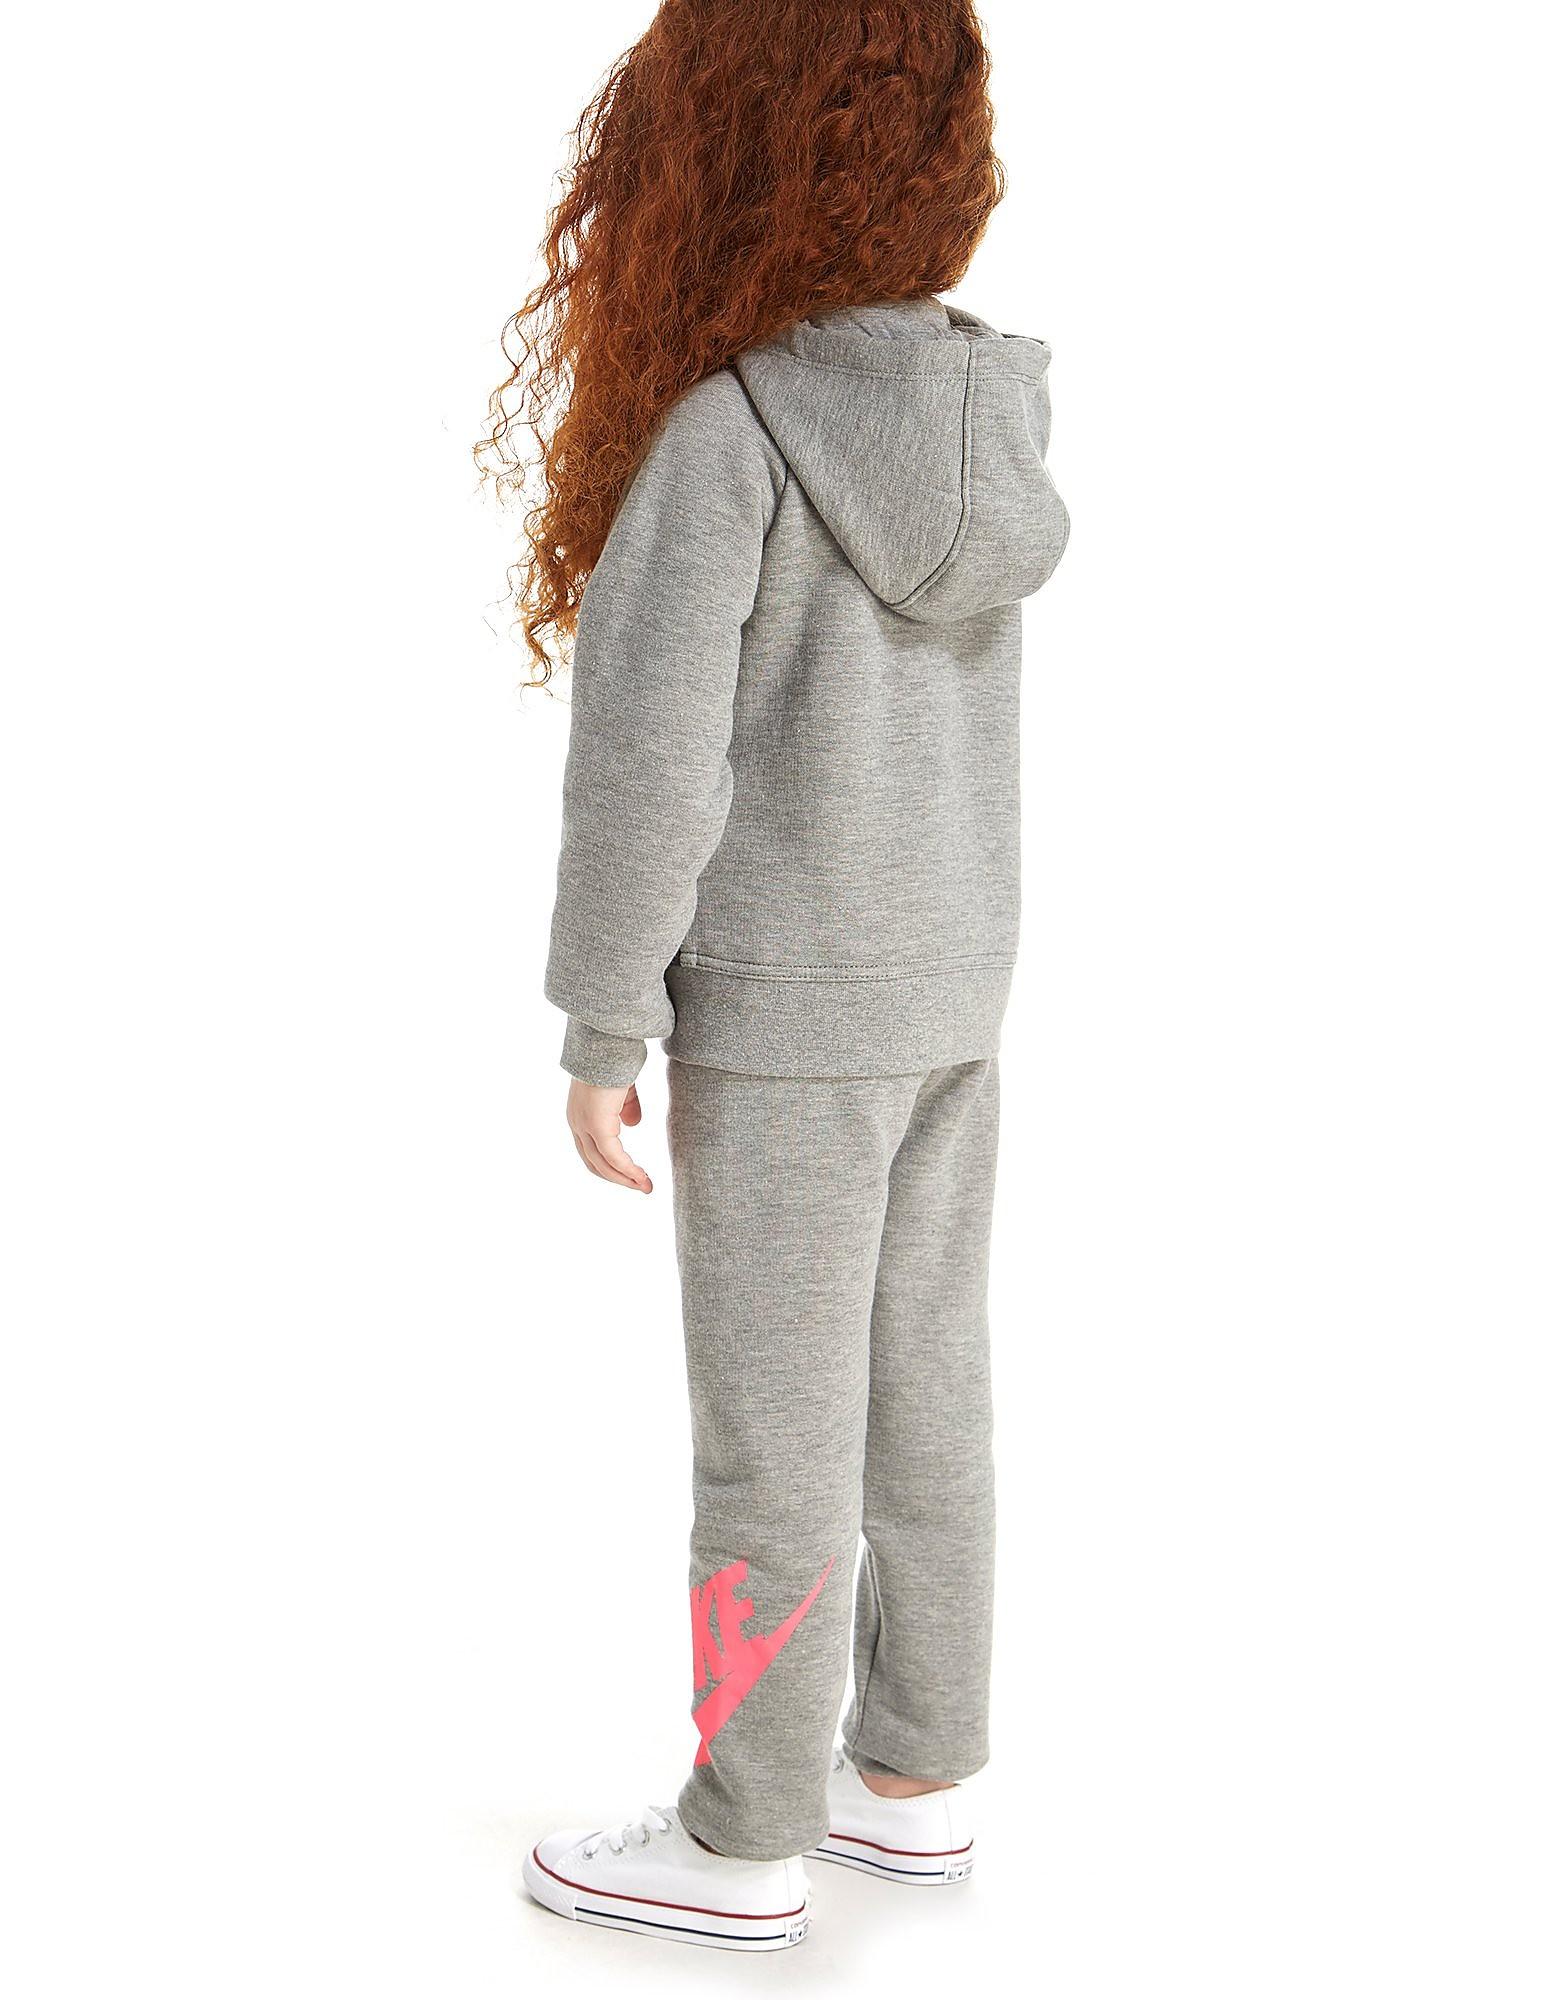 Nike Girls' Futura Suit Children